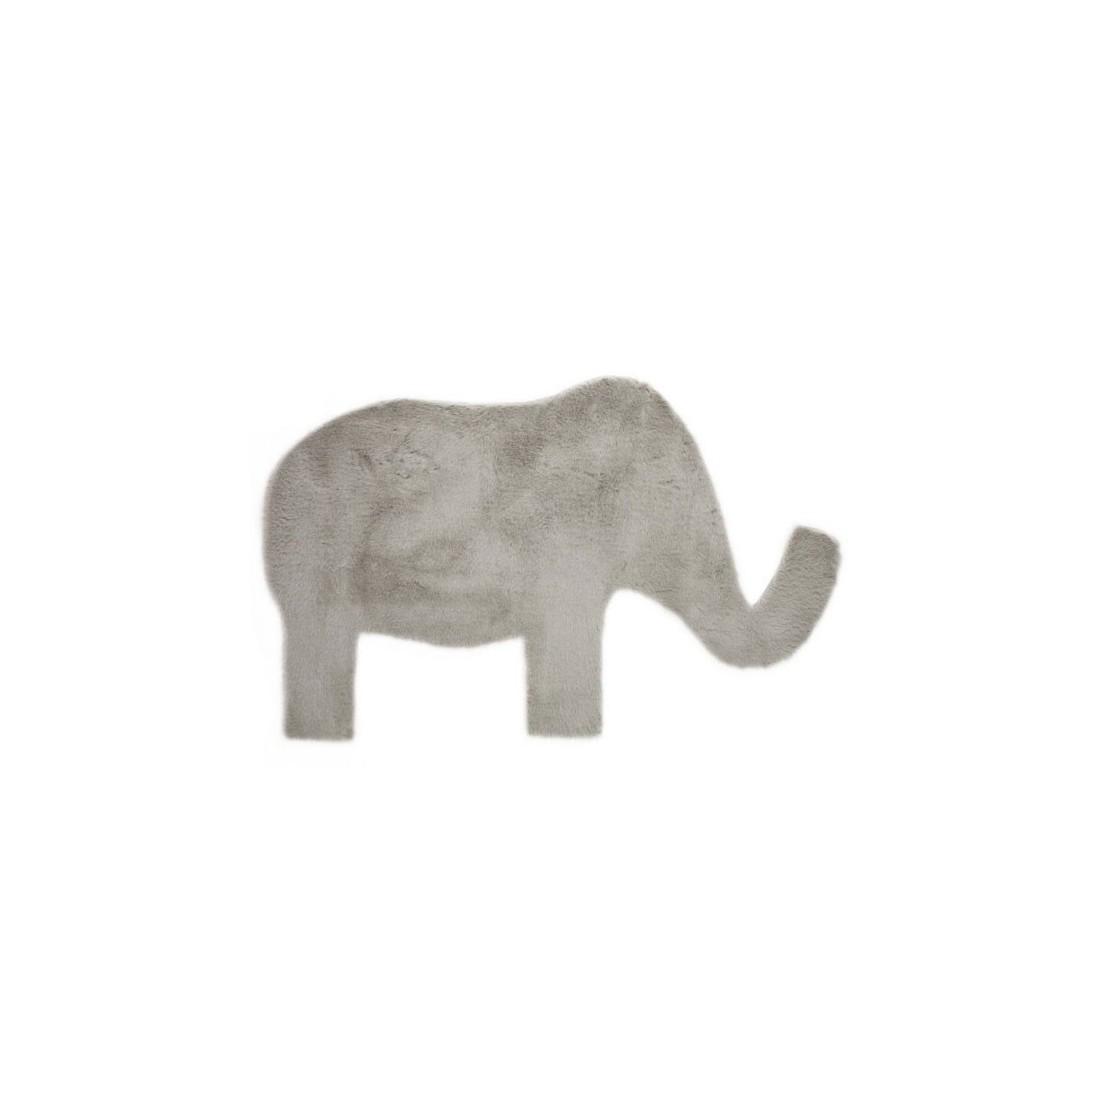 Tapis enfant Eléphant gris clair  Pilepoil  Ma Chambramoi